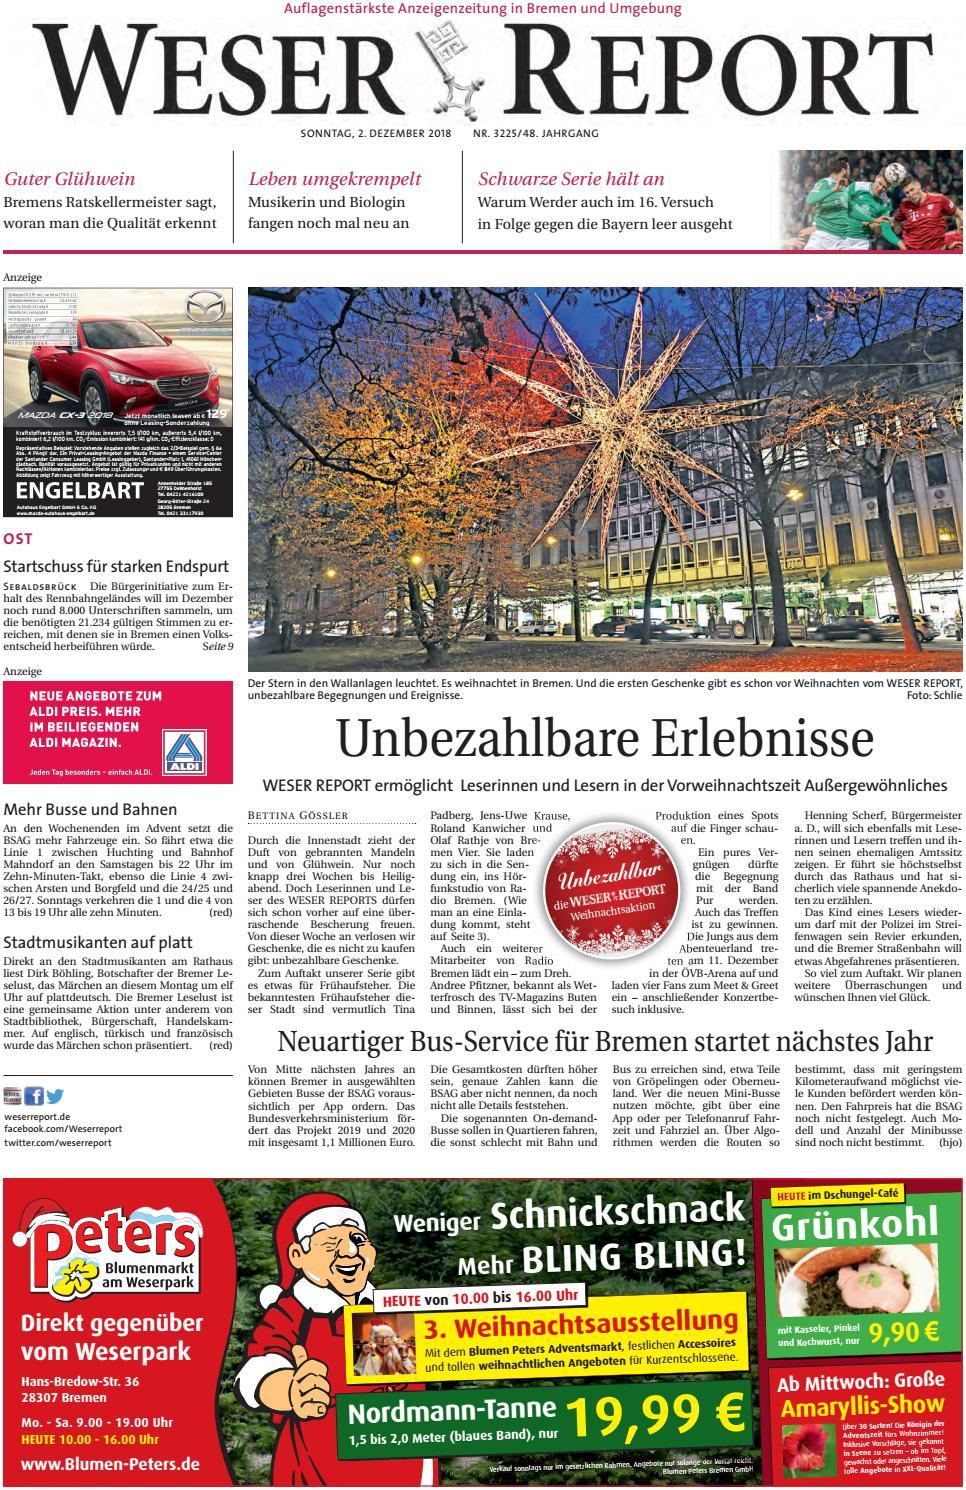 Weser Report Ost vom 02.12.2018 by KPS Verlagsgesellschaft